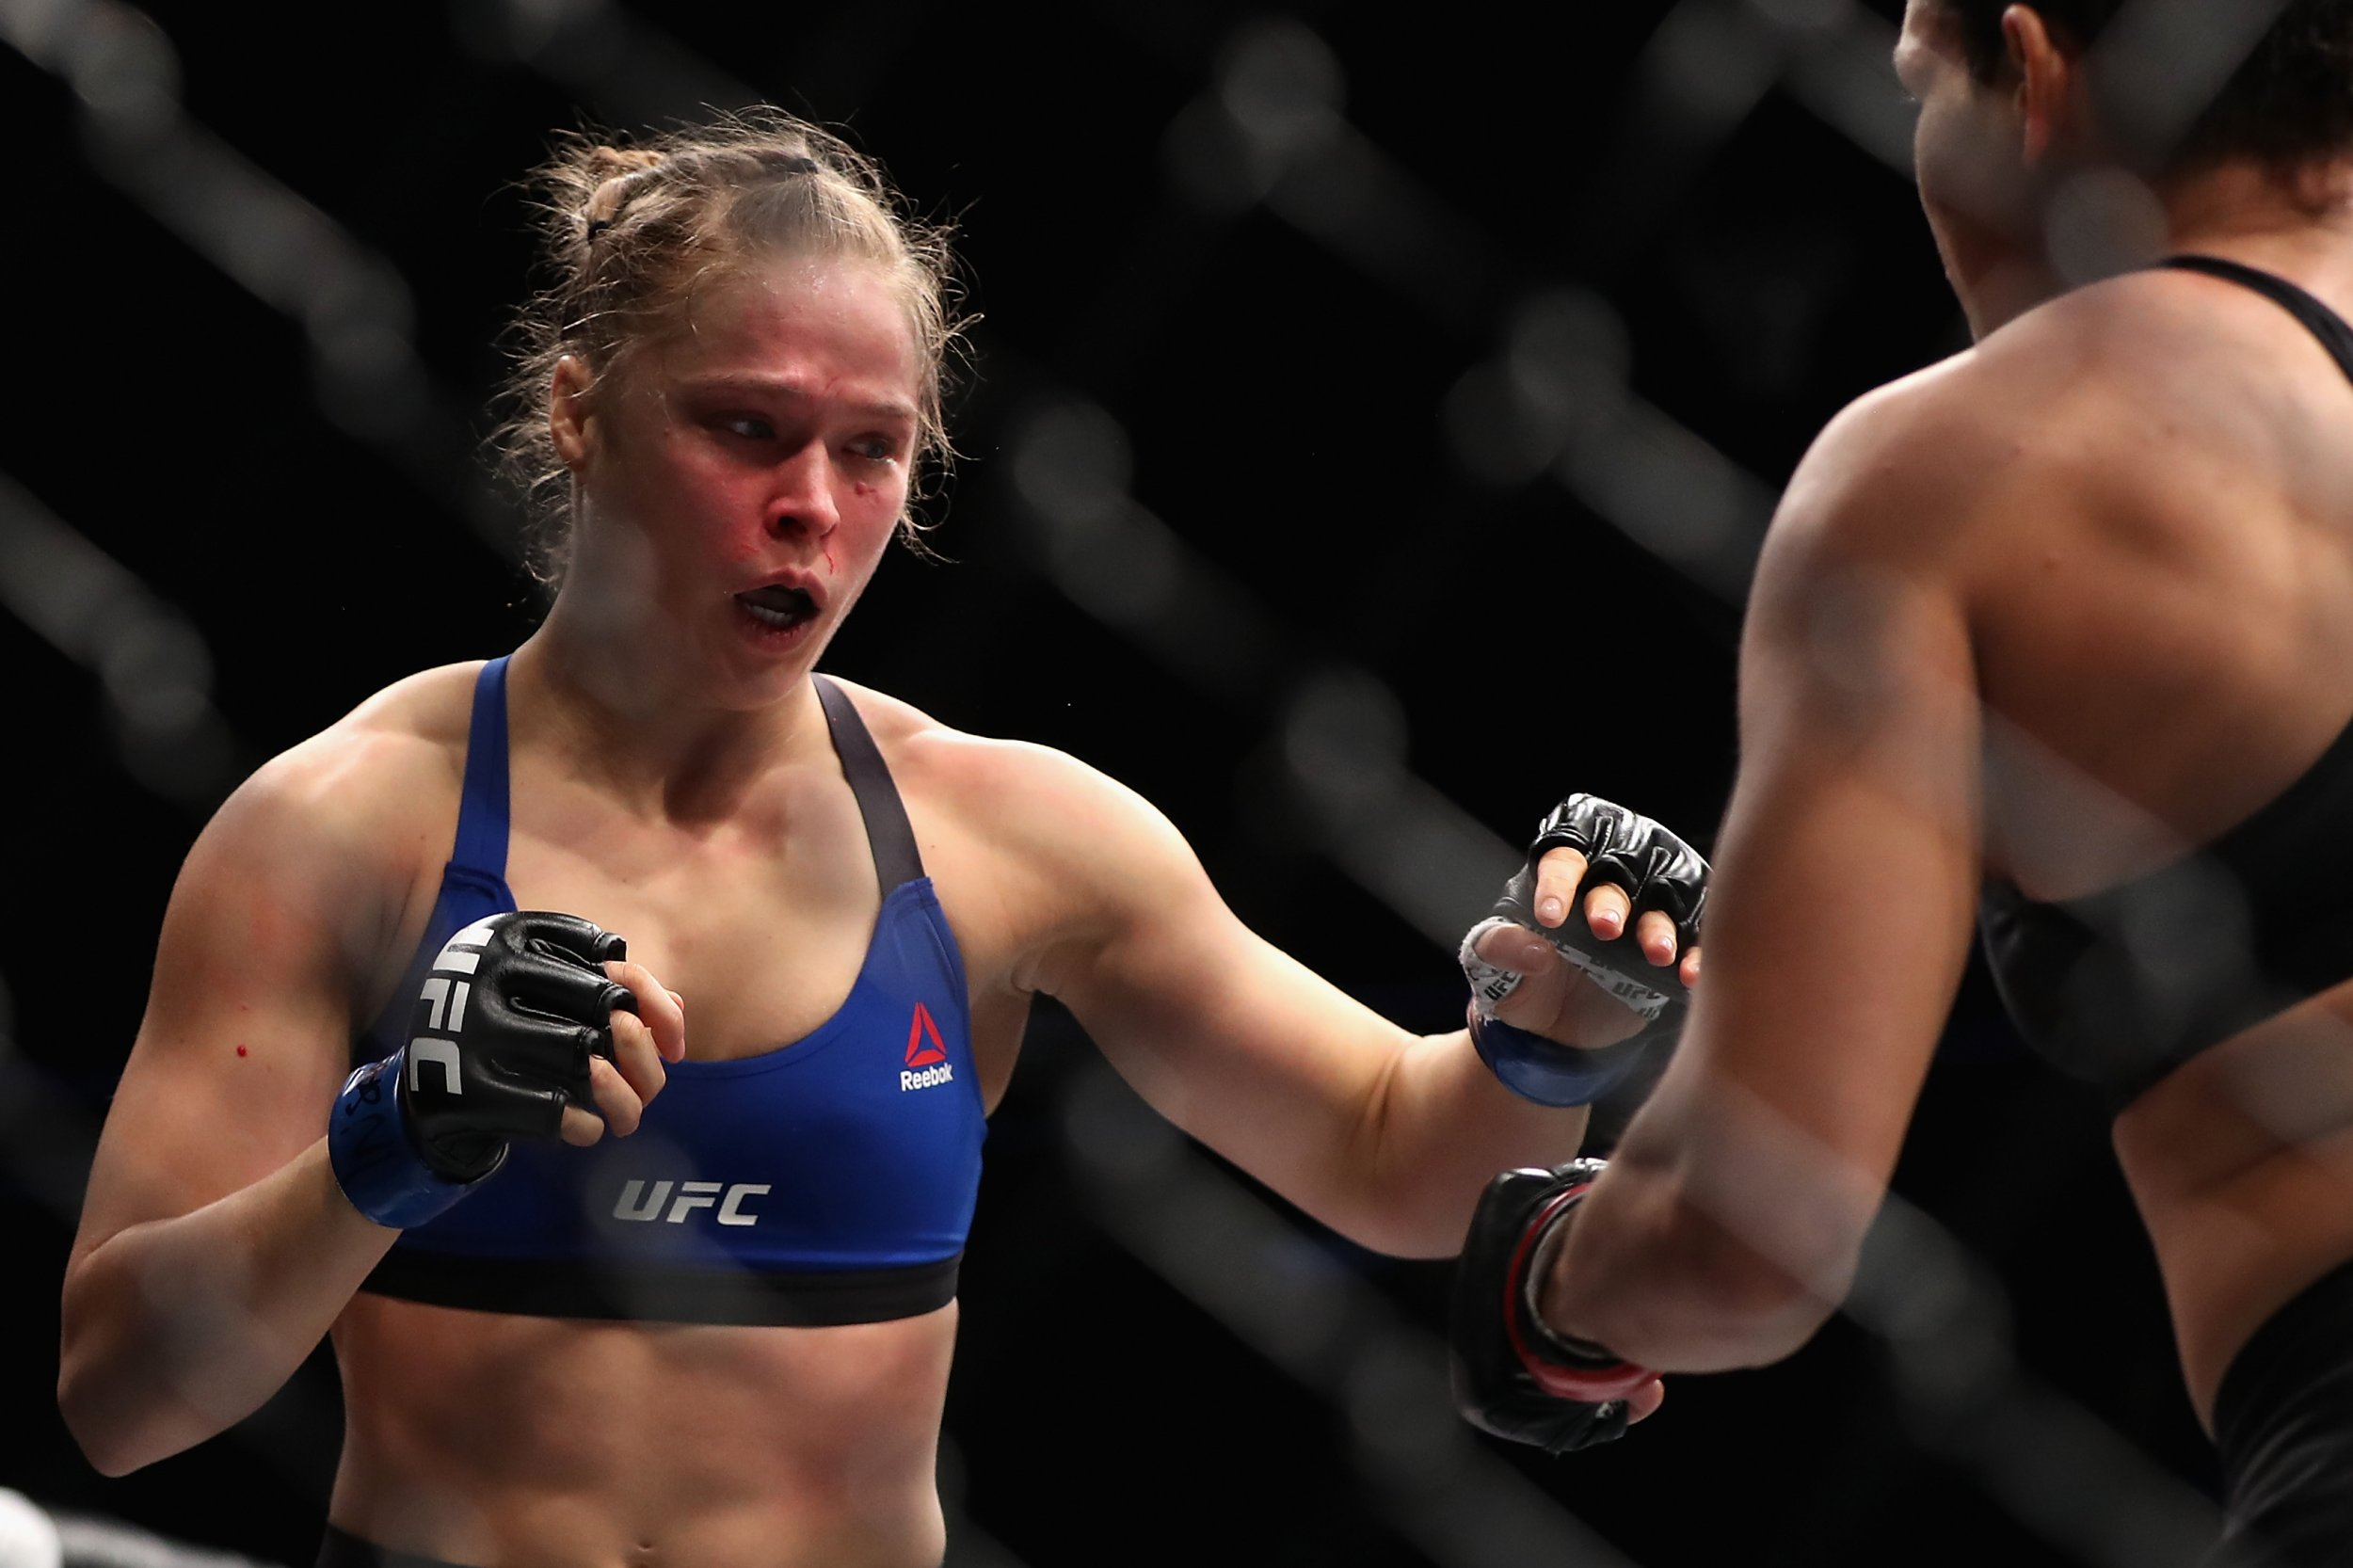 UFC star Ronda Rousey, left.